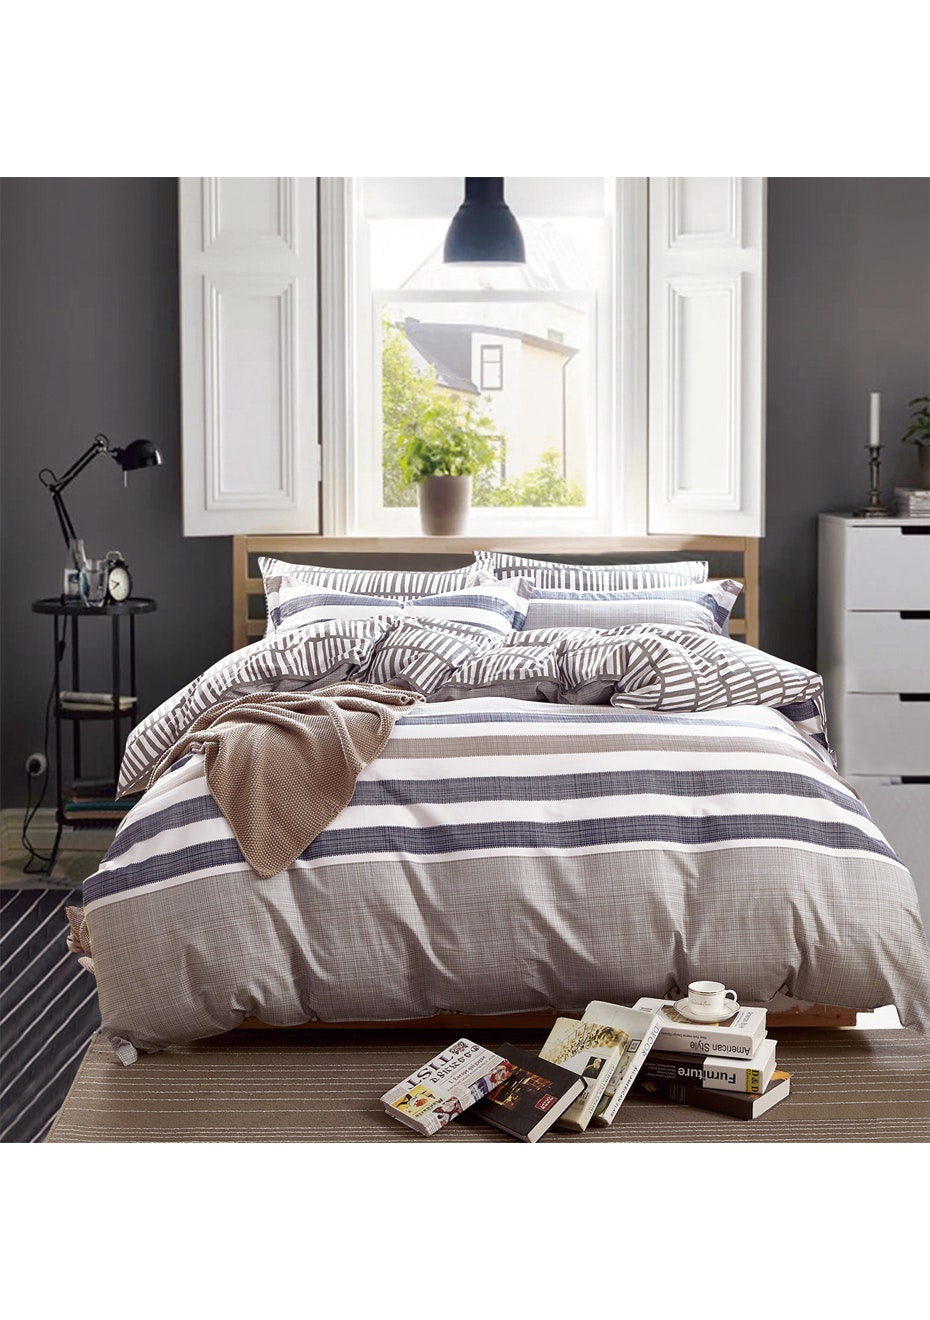 Ballina Quilt Cover Set - Reversible Design - 100% Cotton - Single Bed